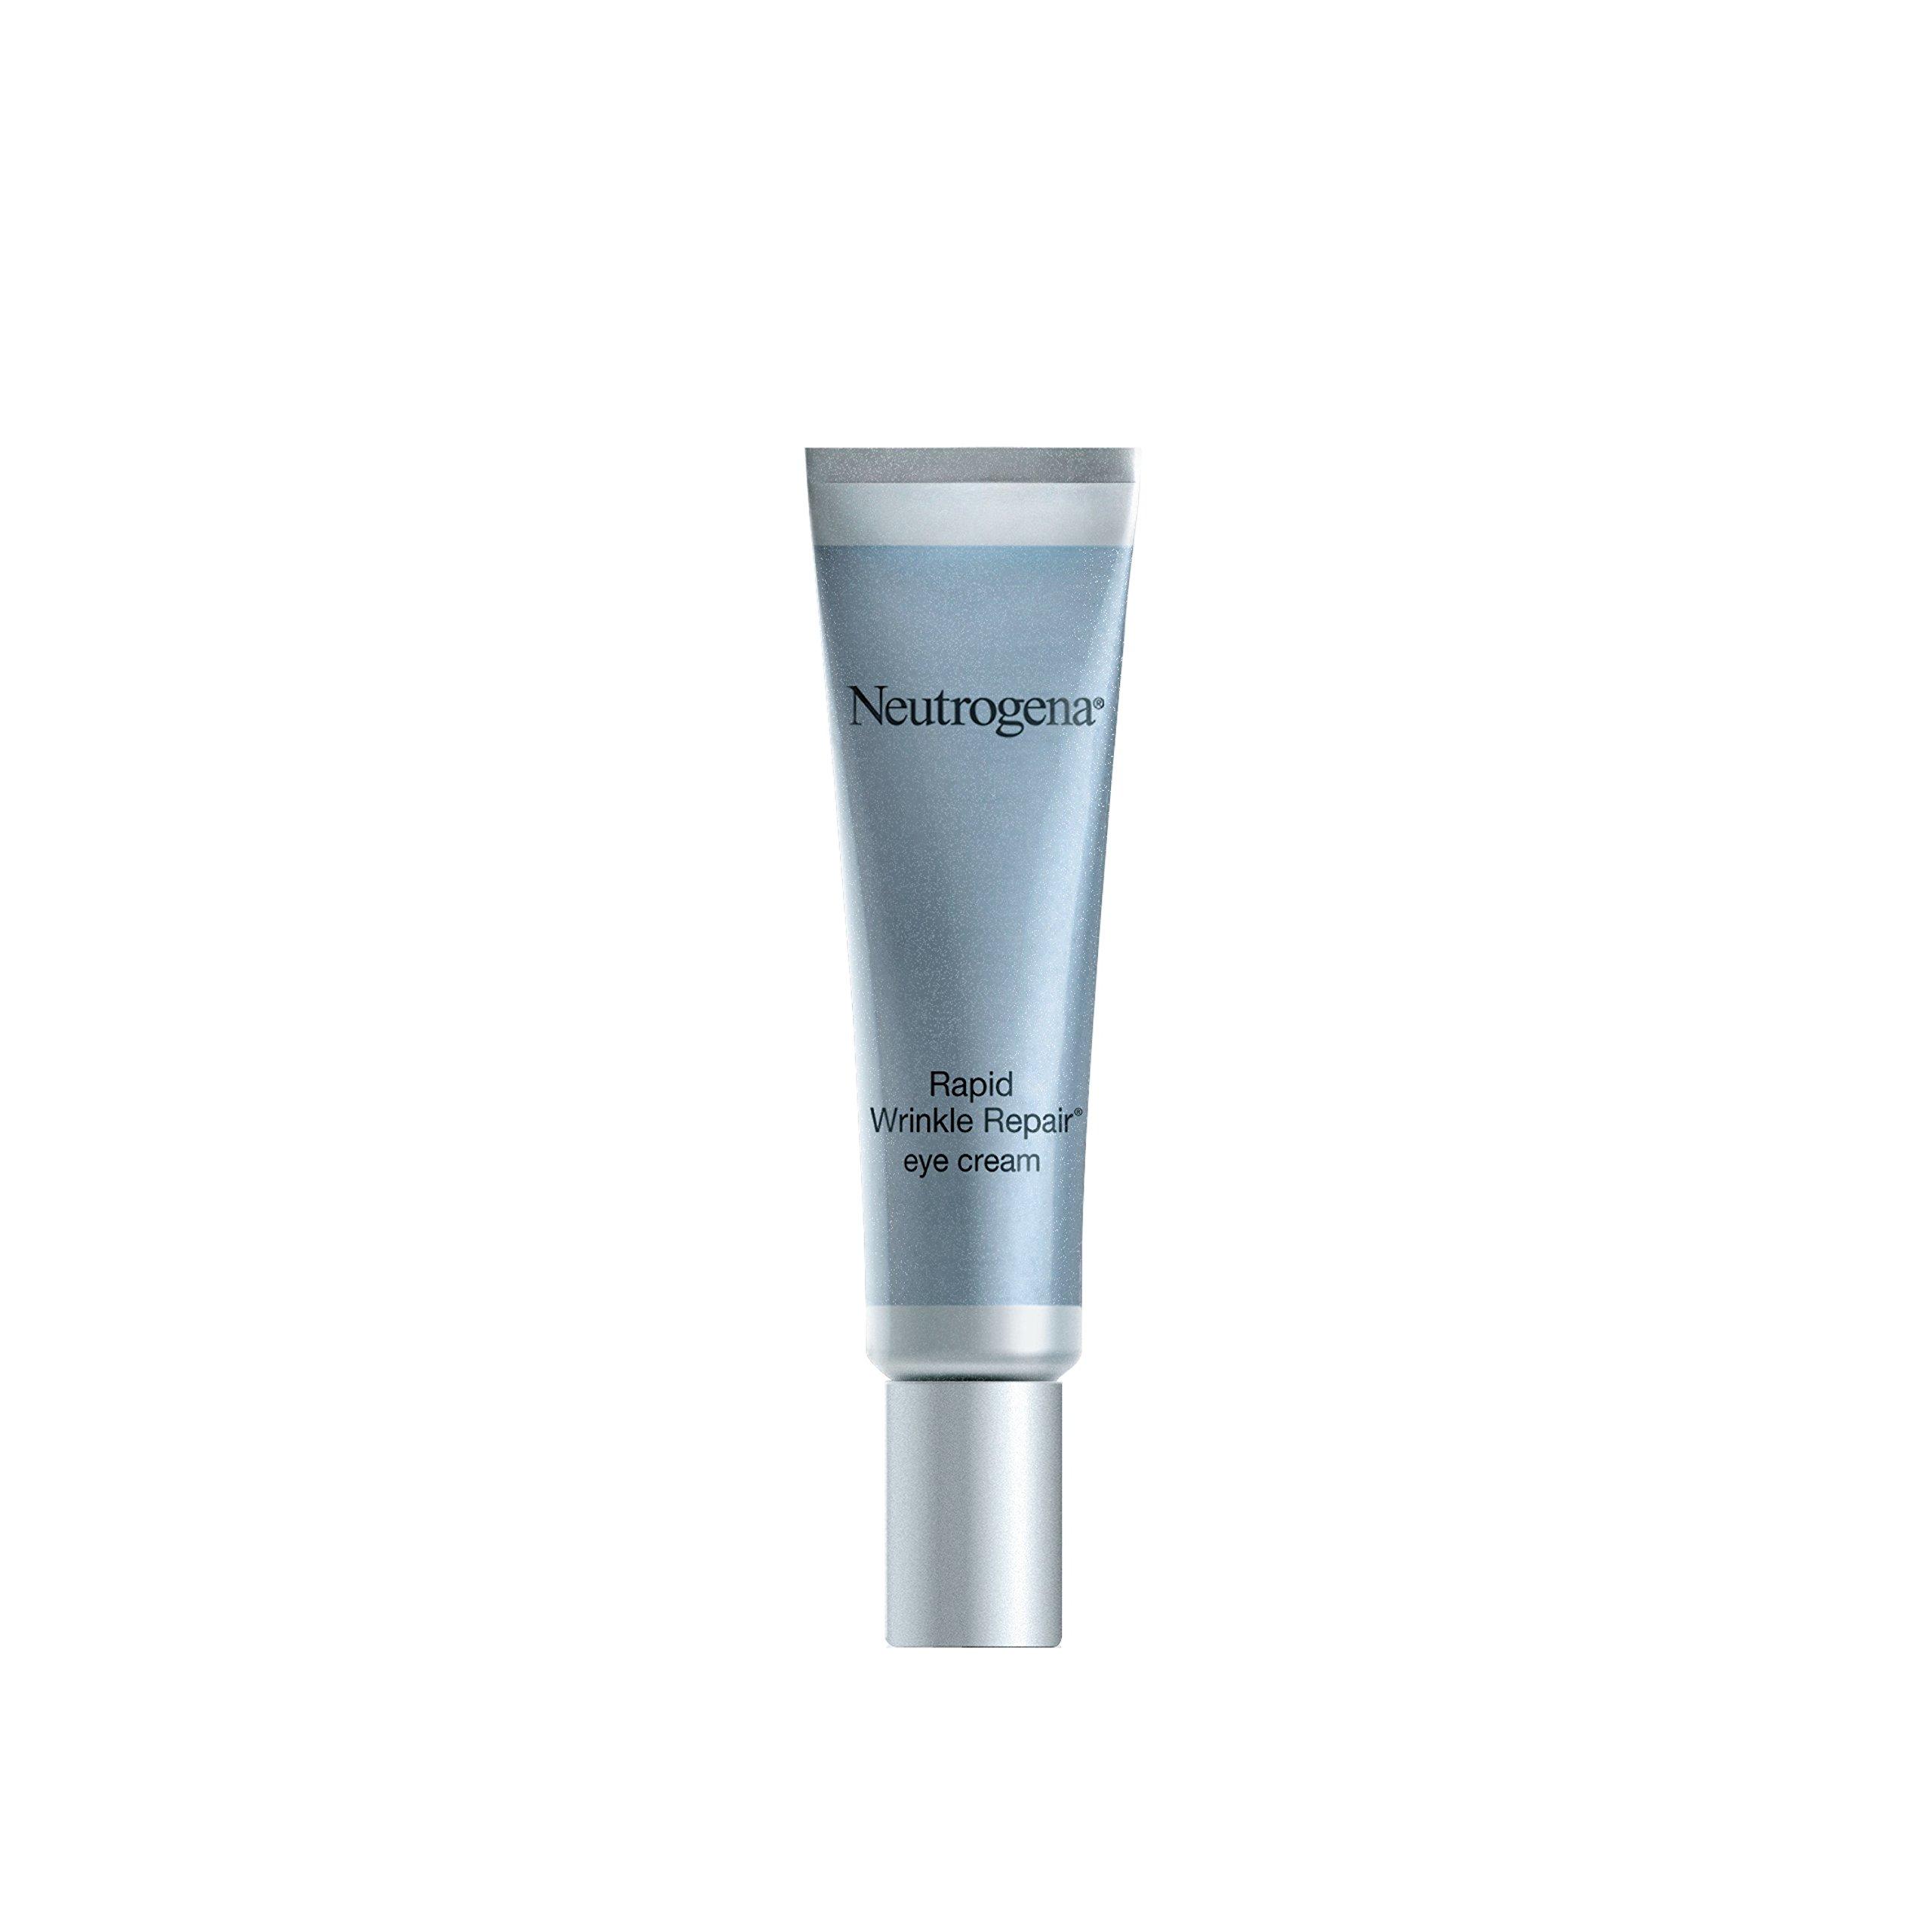 Neutrogena - Neutrogena Rapid Wrinkle Repair Hyaluronic Acid Retinol Under Eye Cream - Anti Wrinkle Eye Cream for Dark Circles & Puffiness & Under Eye Bags - Hyaluronic Acid, Glycerin & Retinol Cream, 0.5 fl. oz